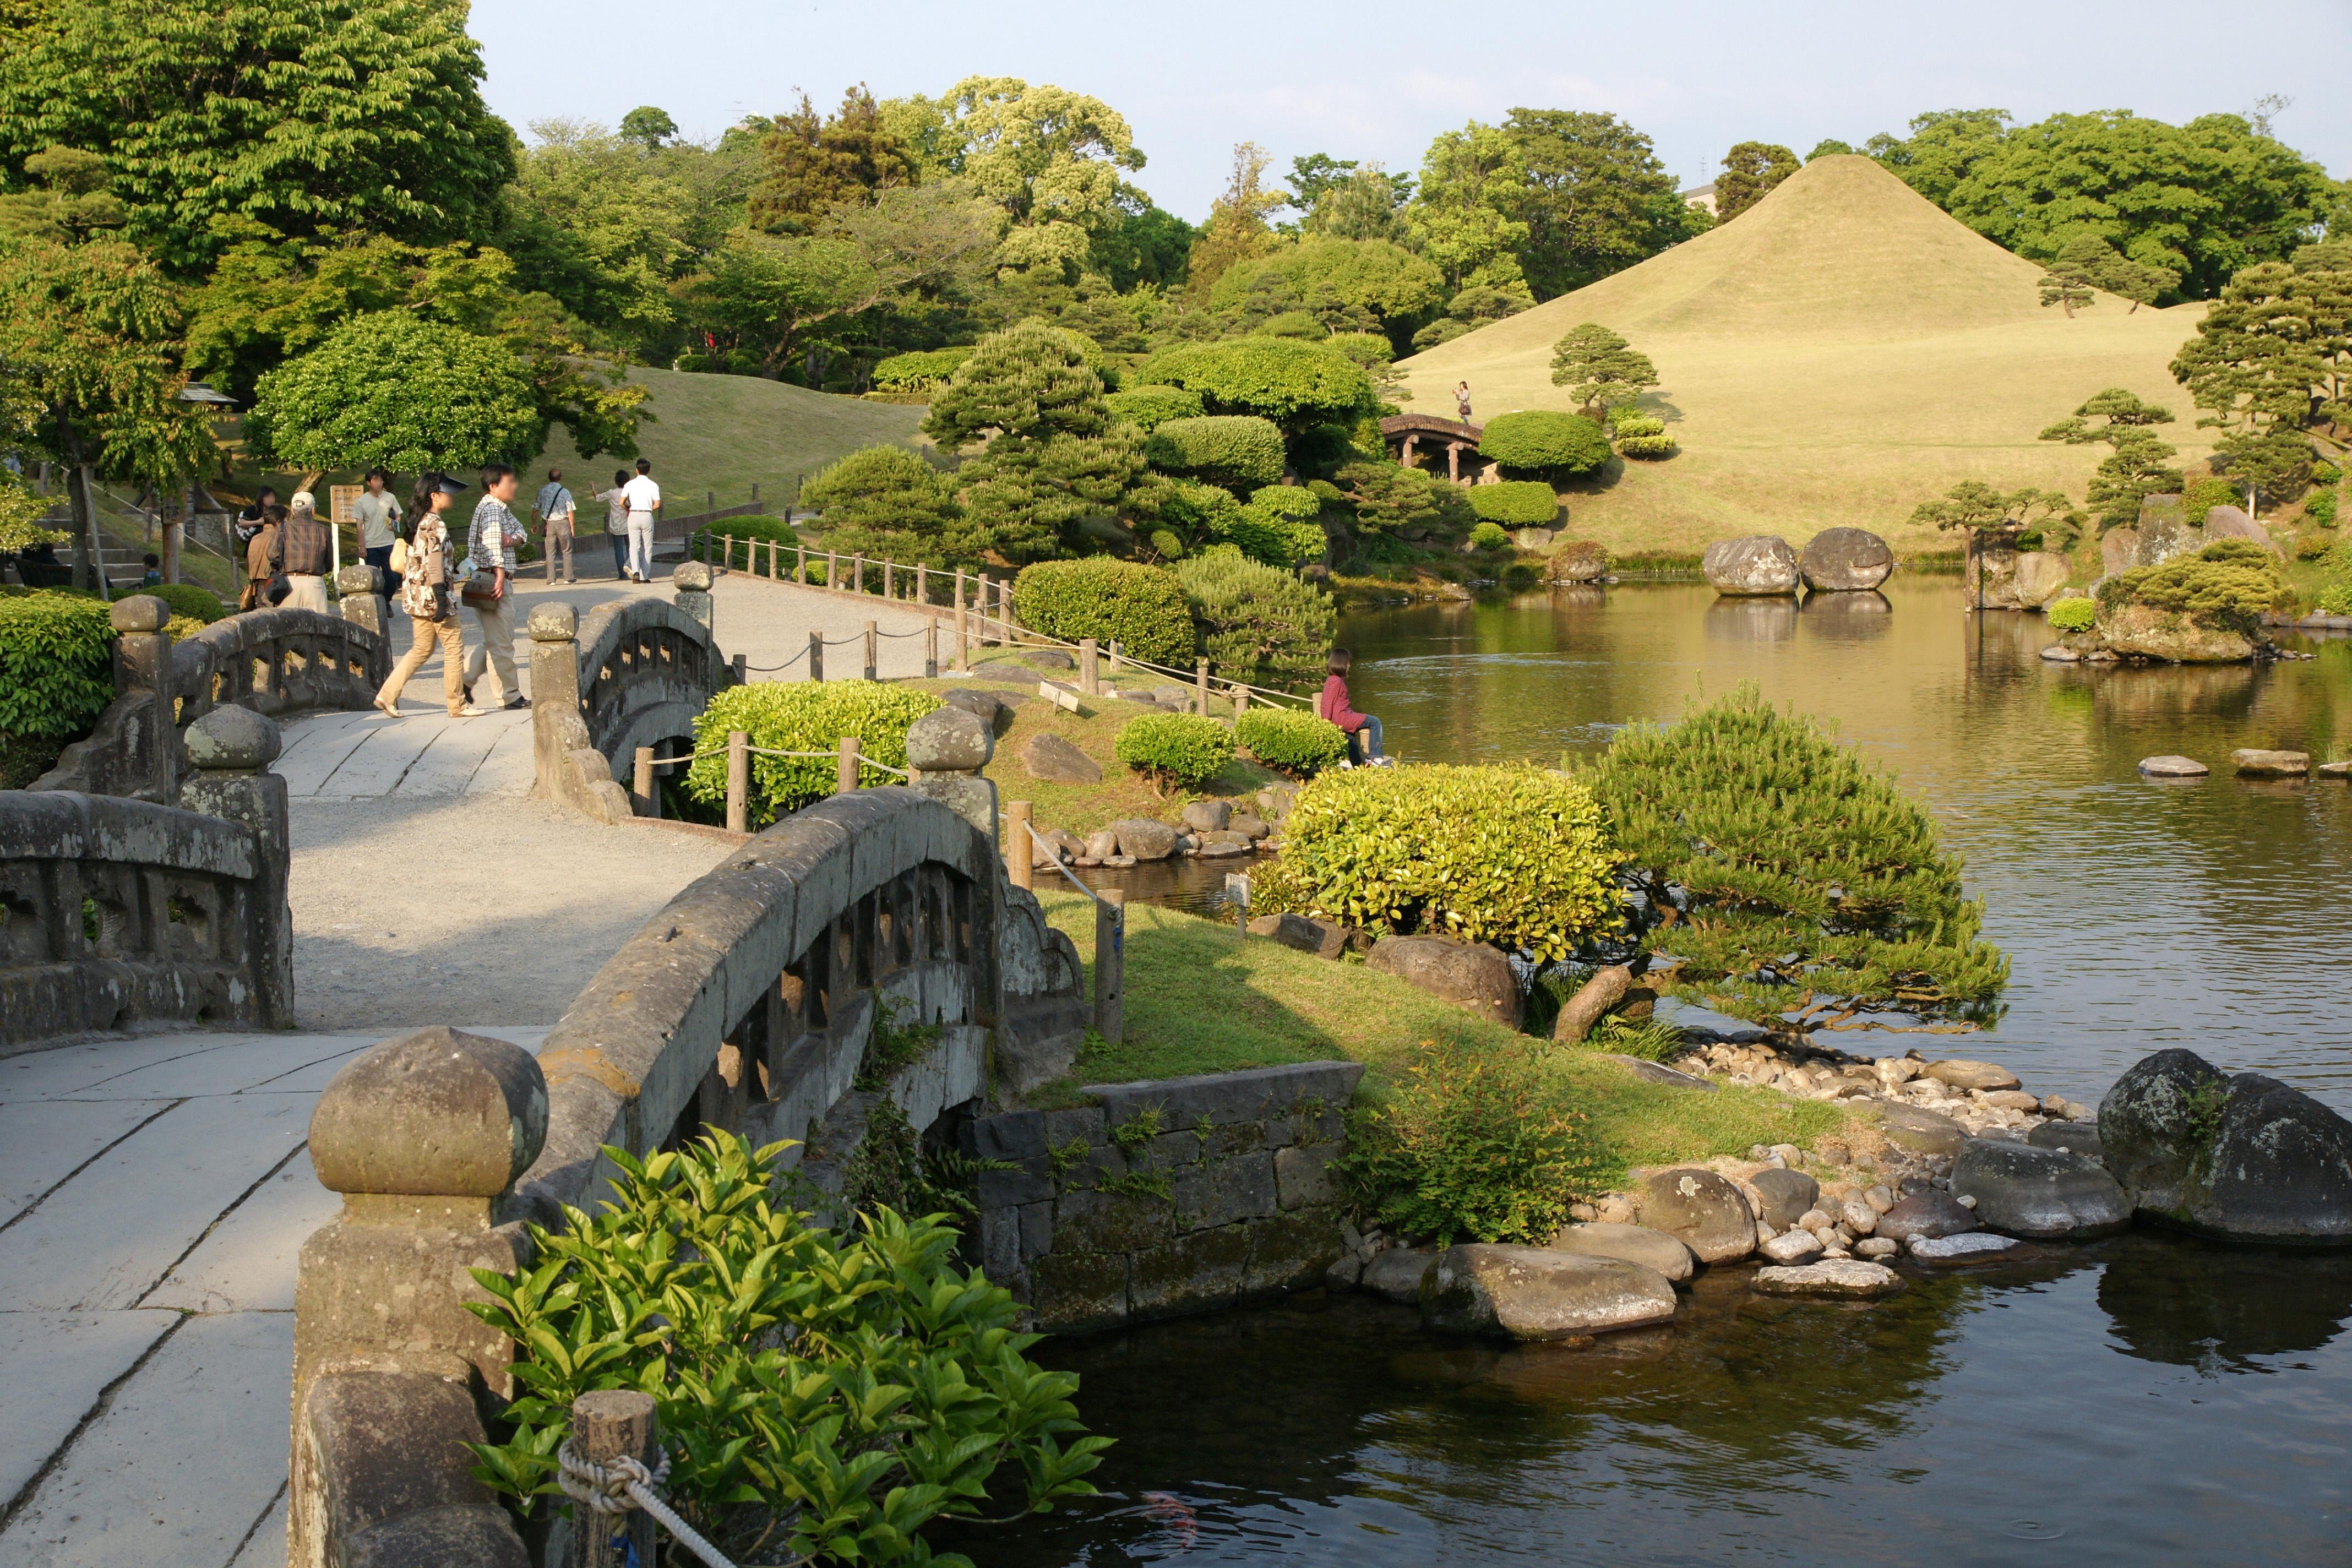 File:Kumamoto Suizenji-jojuen01n4272.jpg - Wikimedia Commons